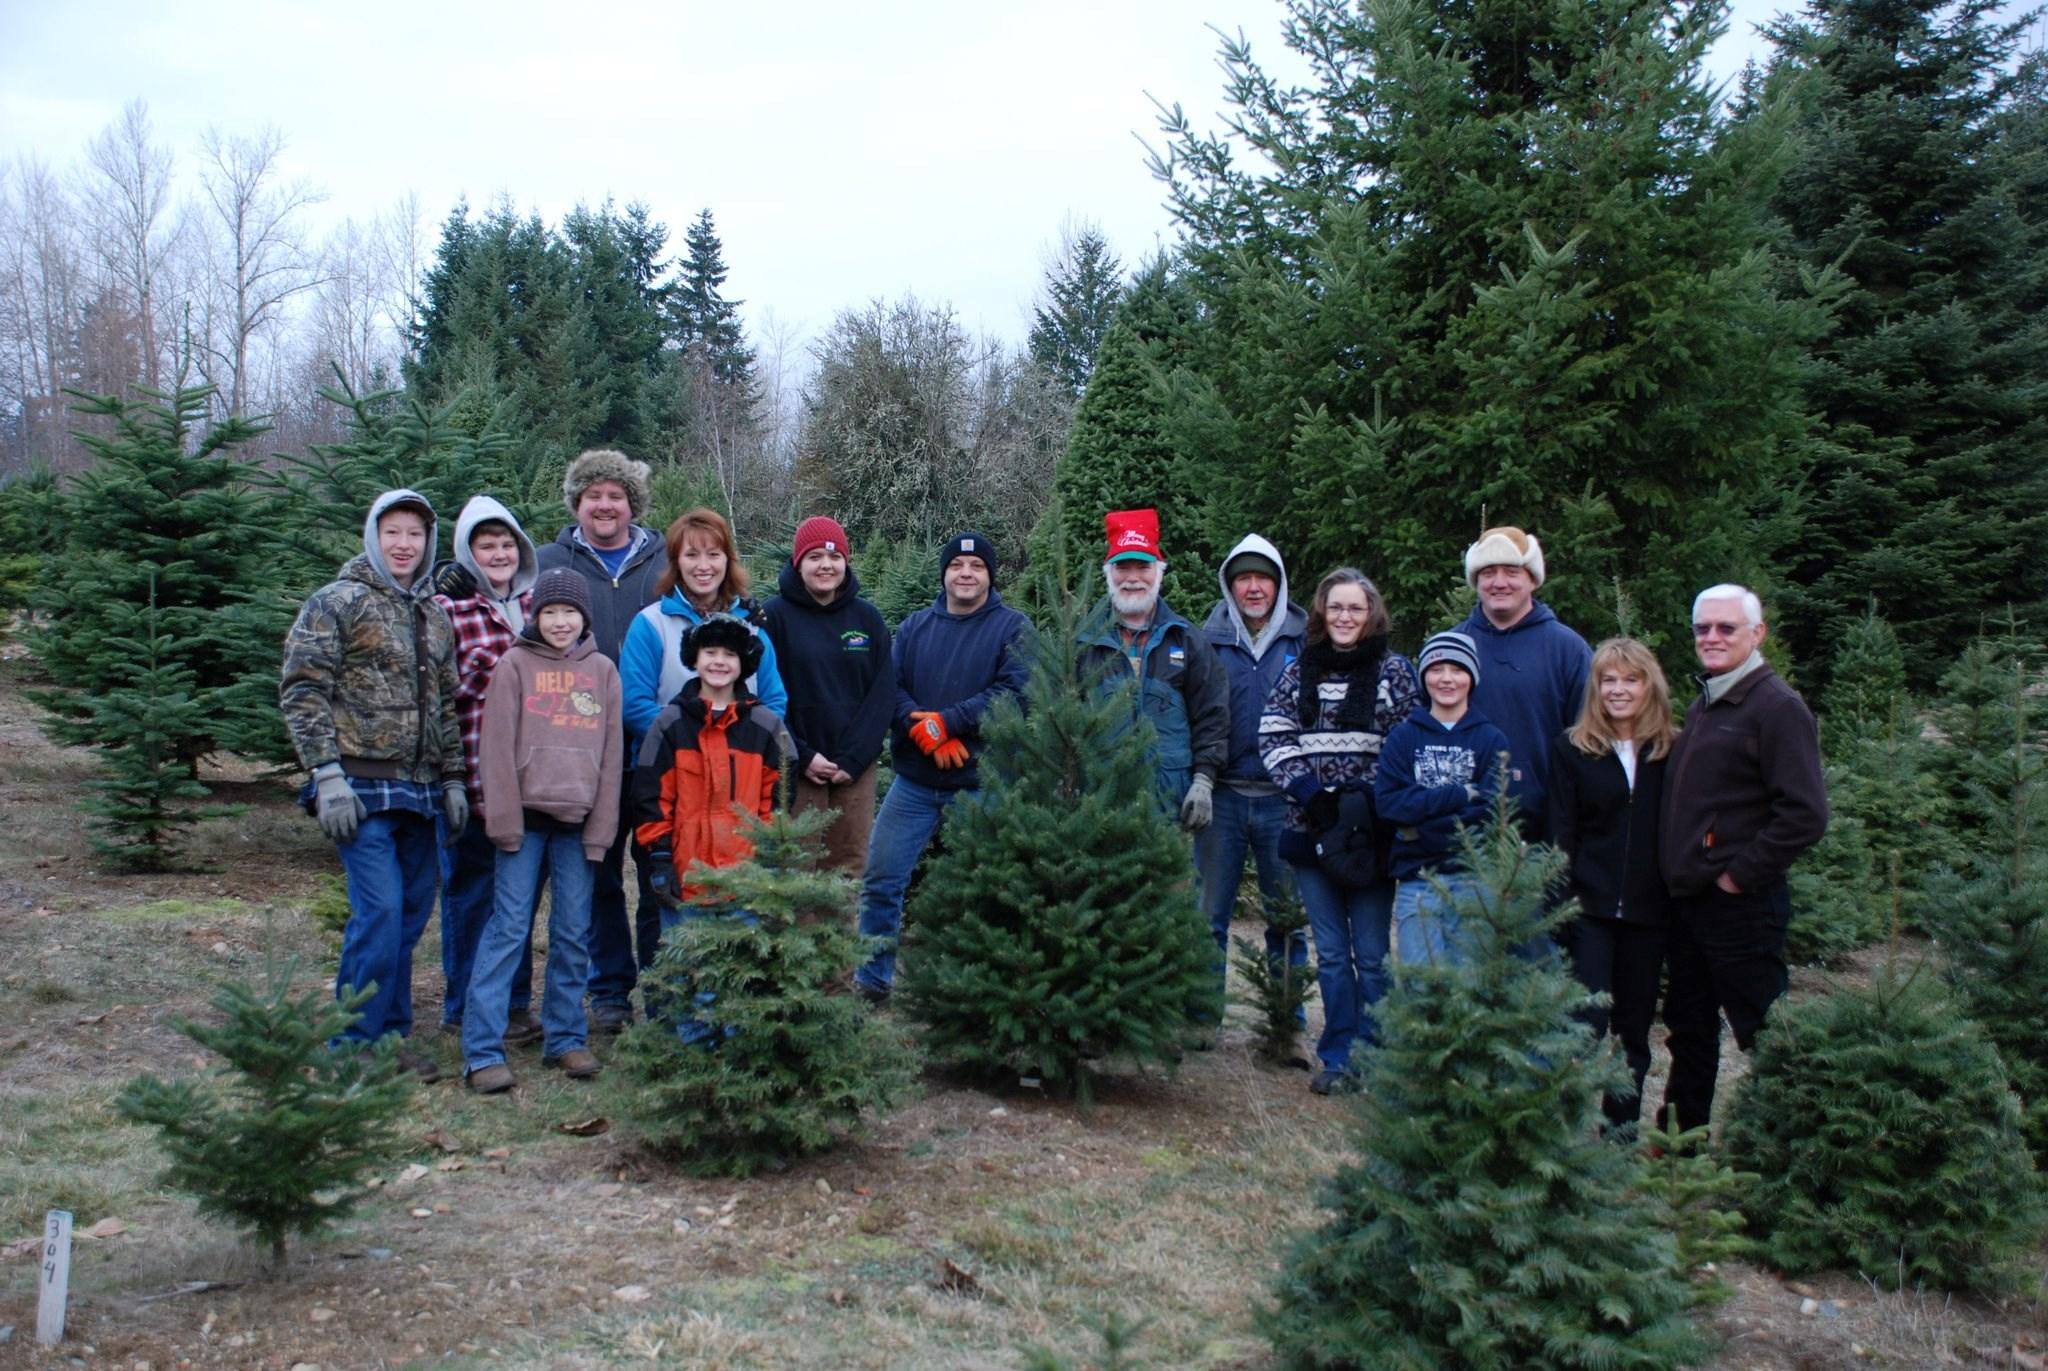 Wilson Hill Tree Farm & Nursery christmas tree farm | ChristmasTreeFarms.net